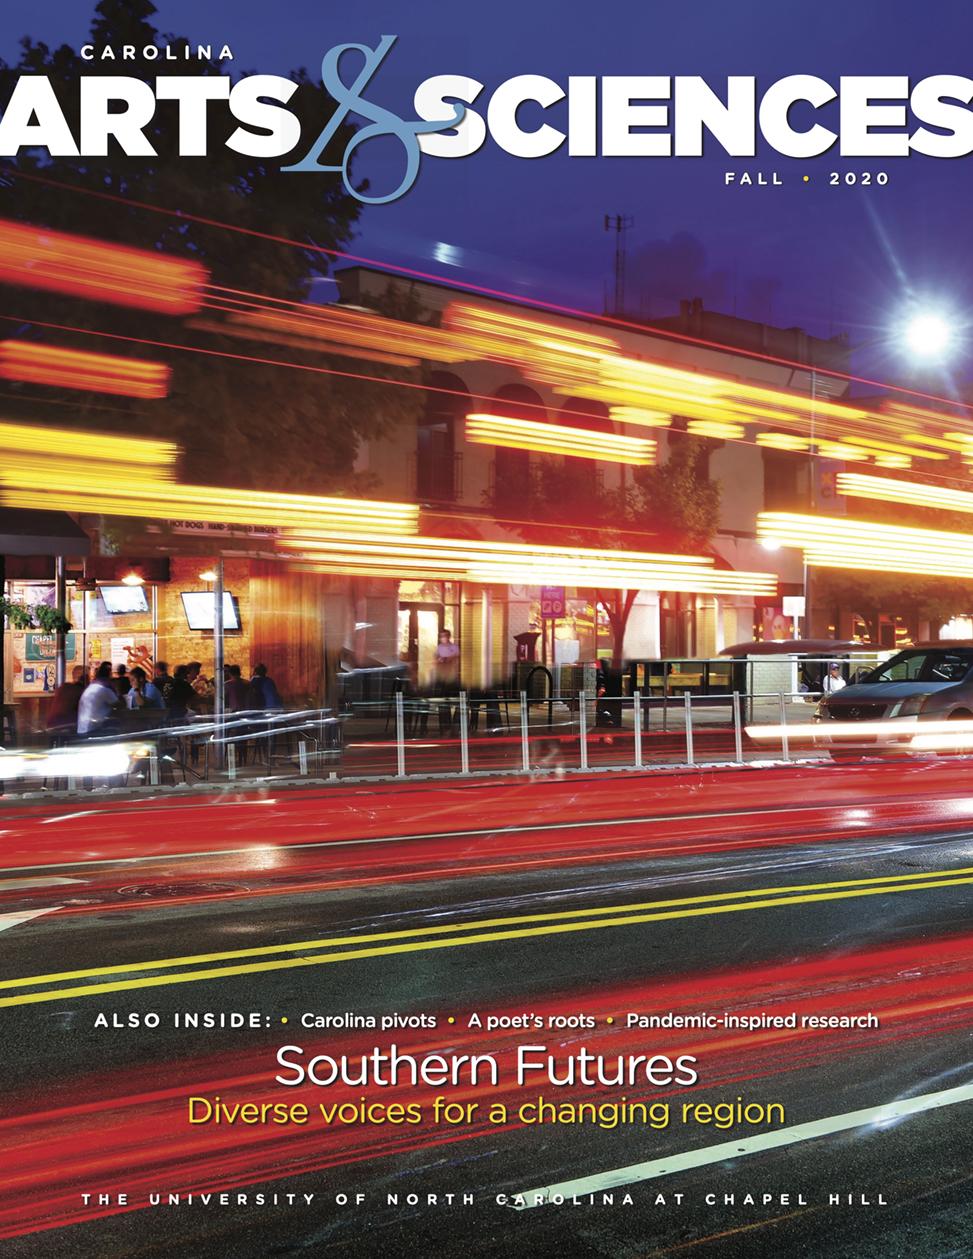 Carolina Arts & Sciences magazine fall 2020 cover